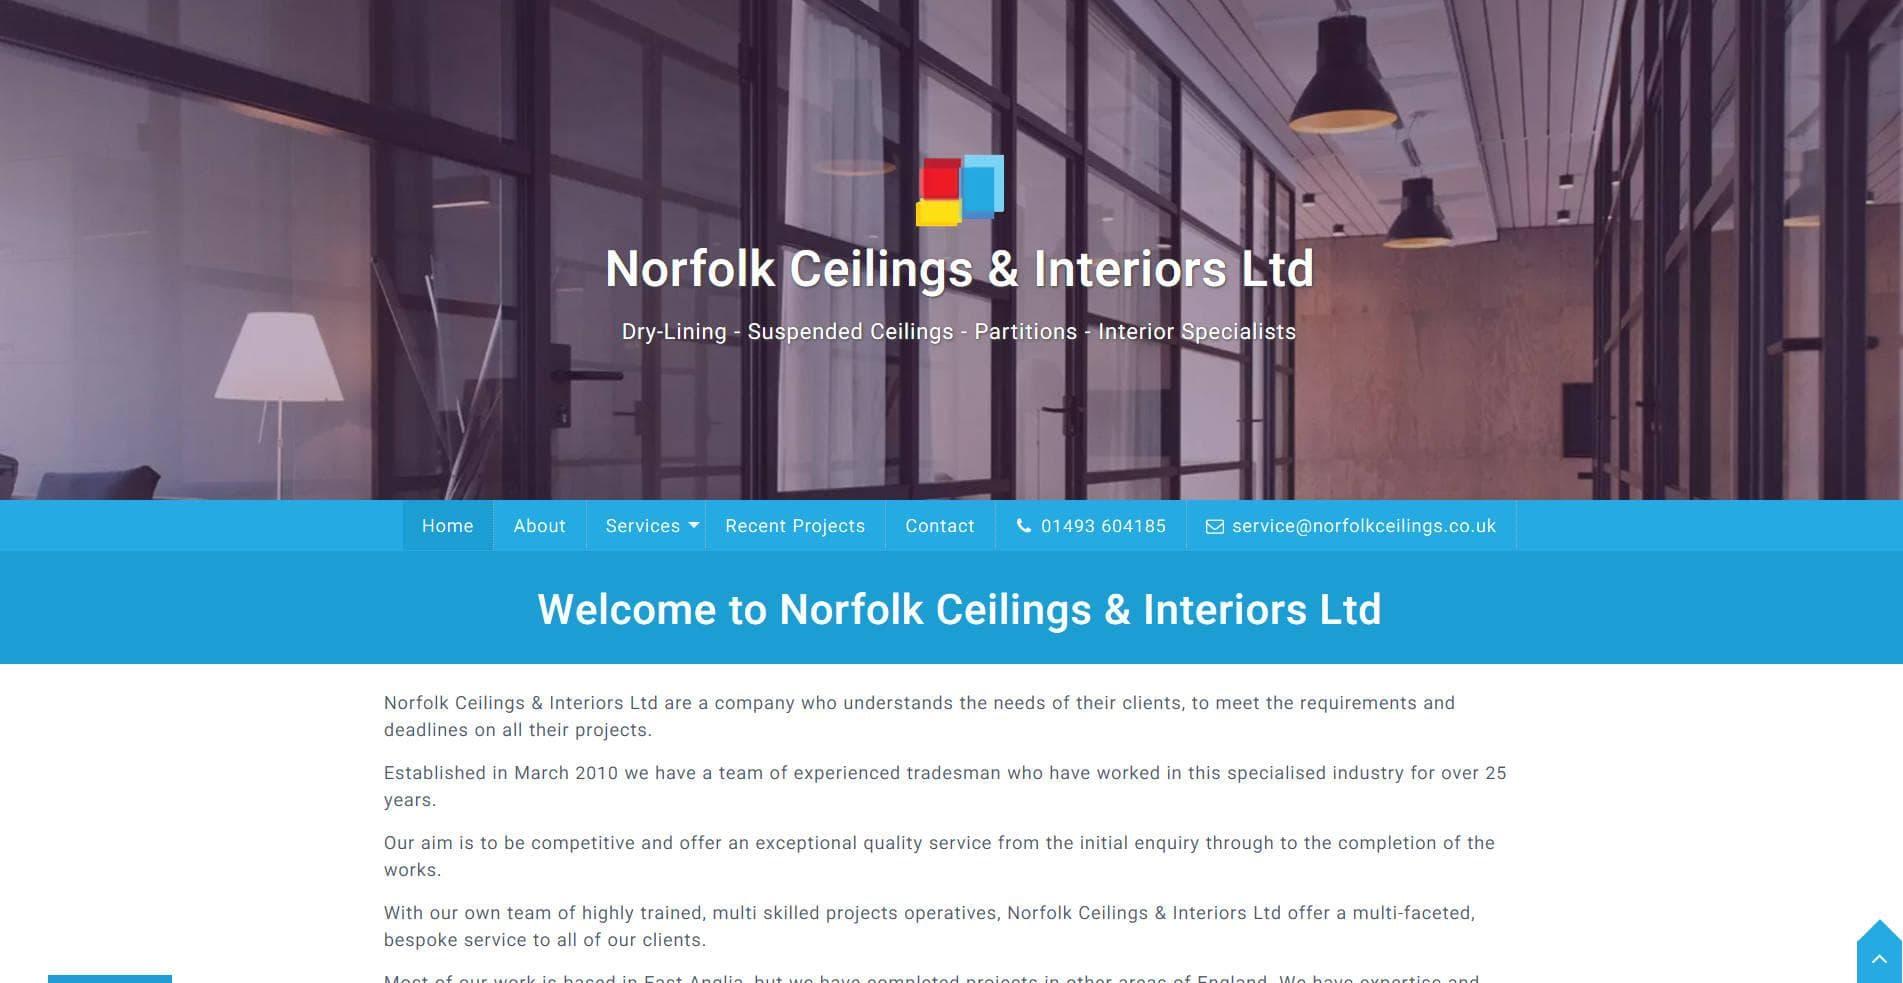 Norfolk Ceilings & Interiors Ltd website frontpage